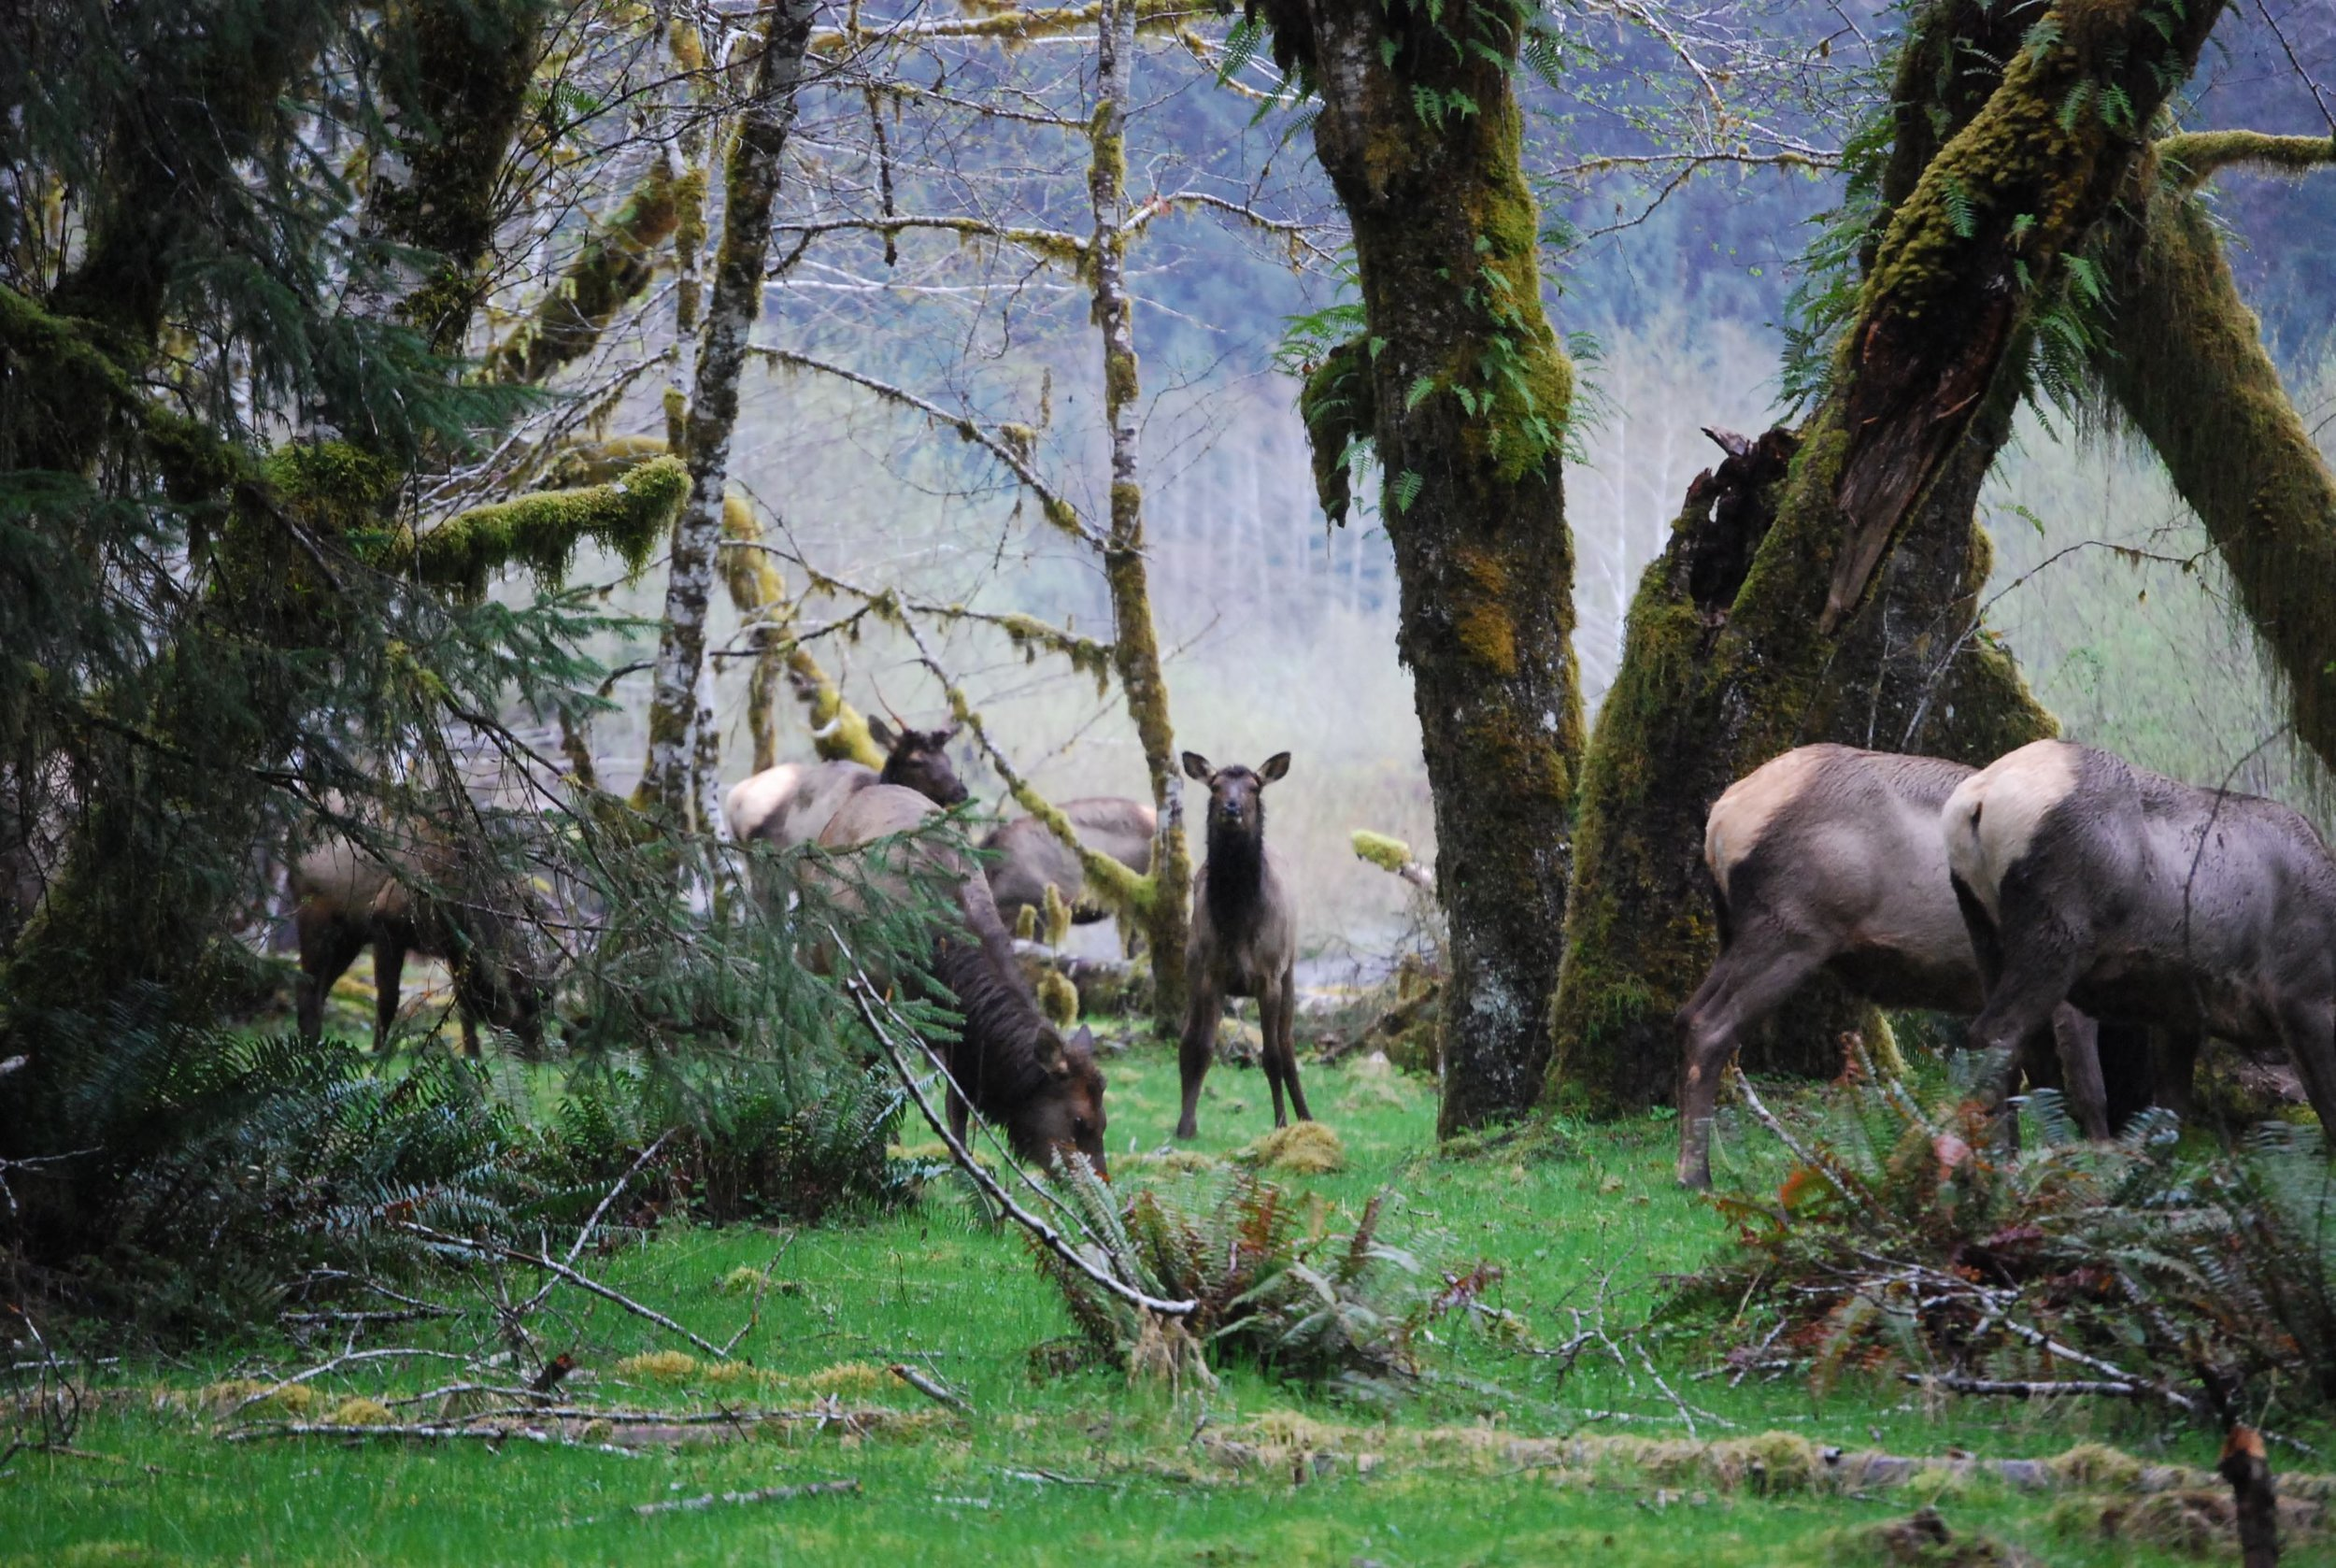 Roosevelt Elk Herd near the Spruce Nature Trail